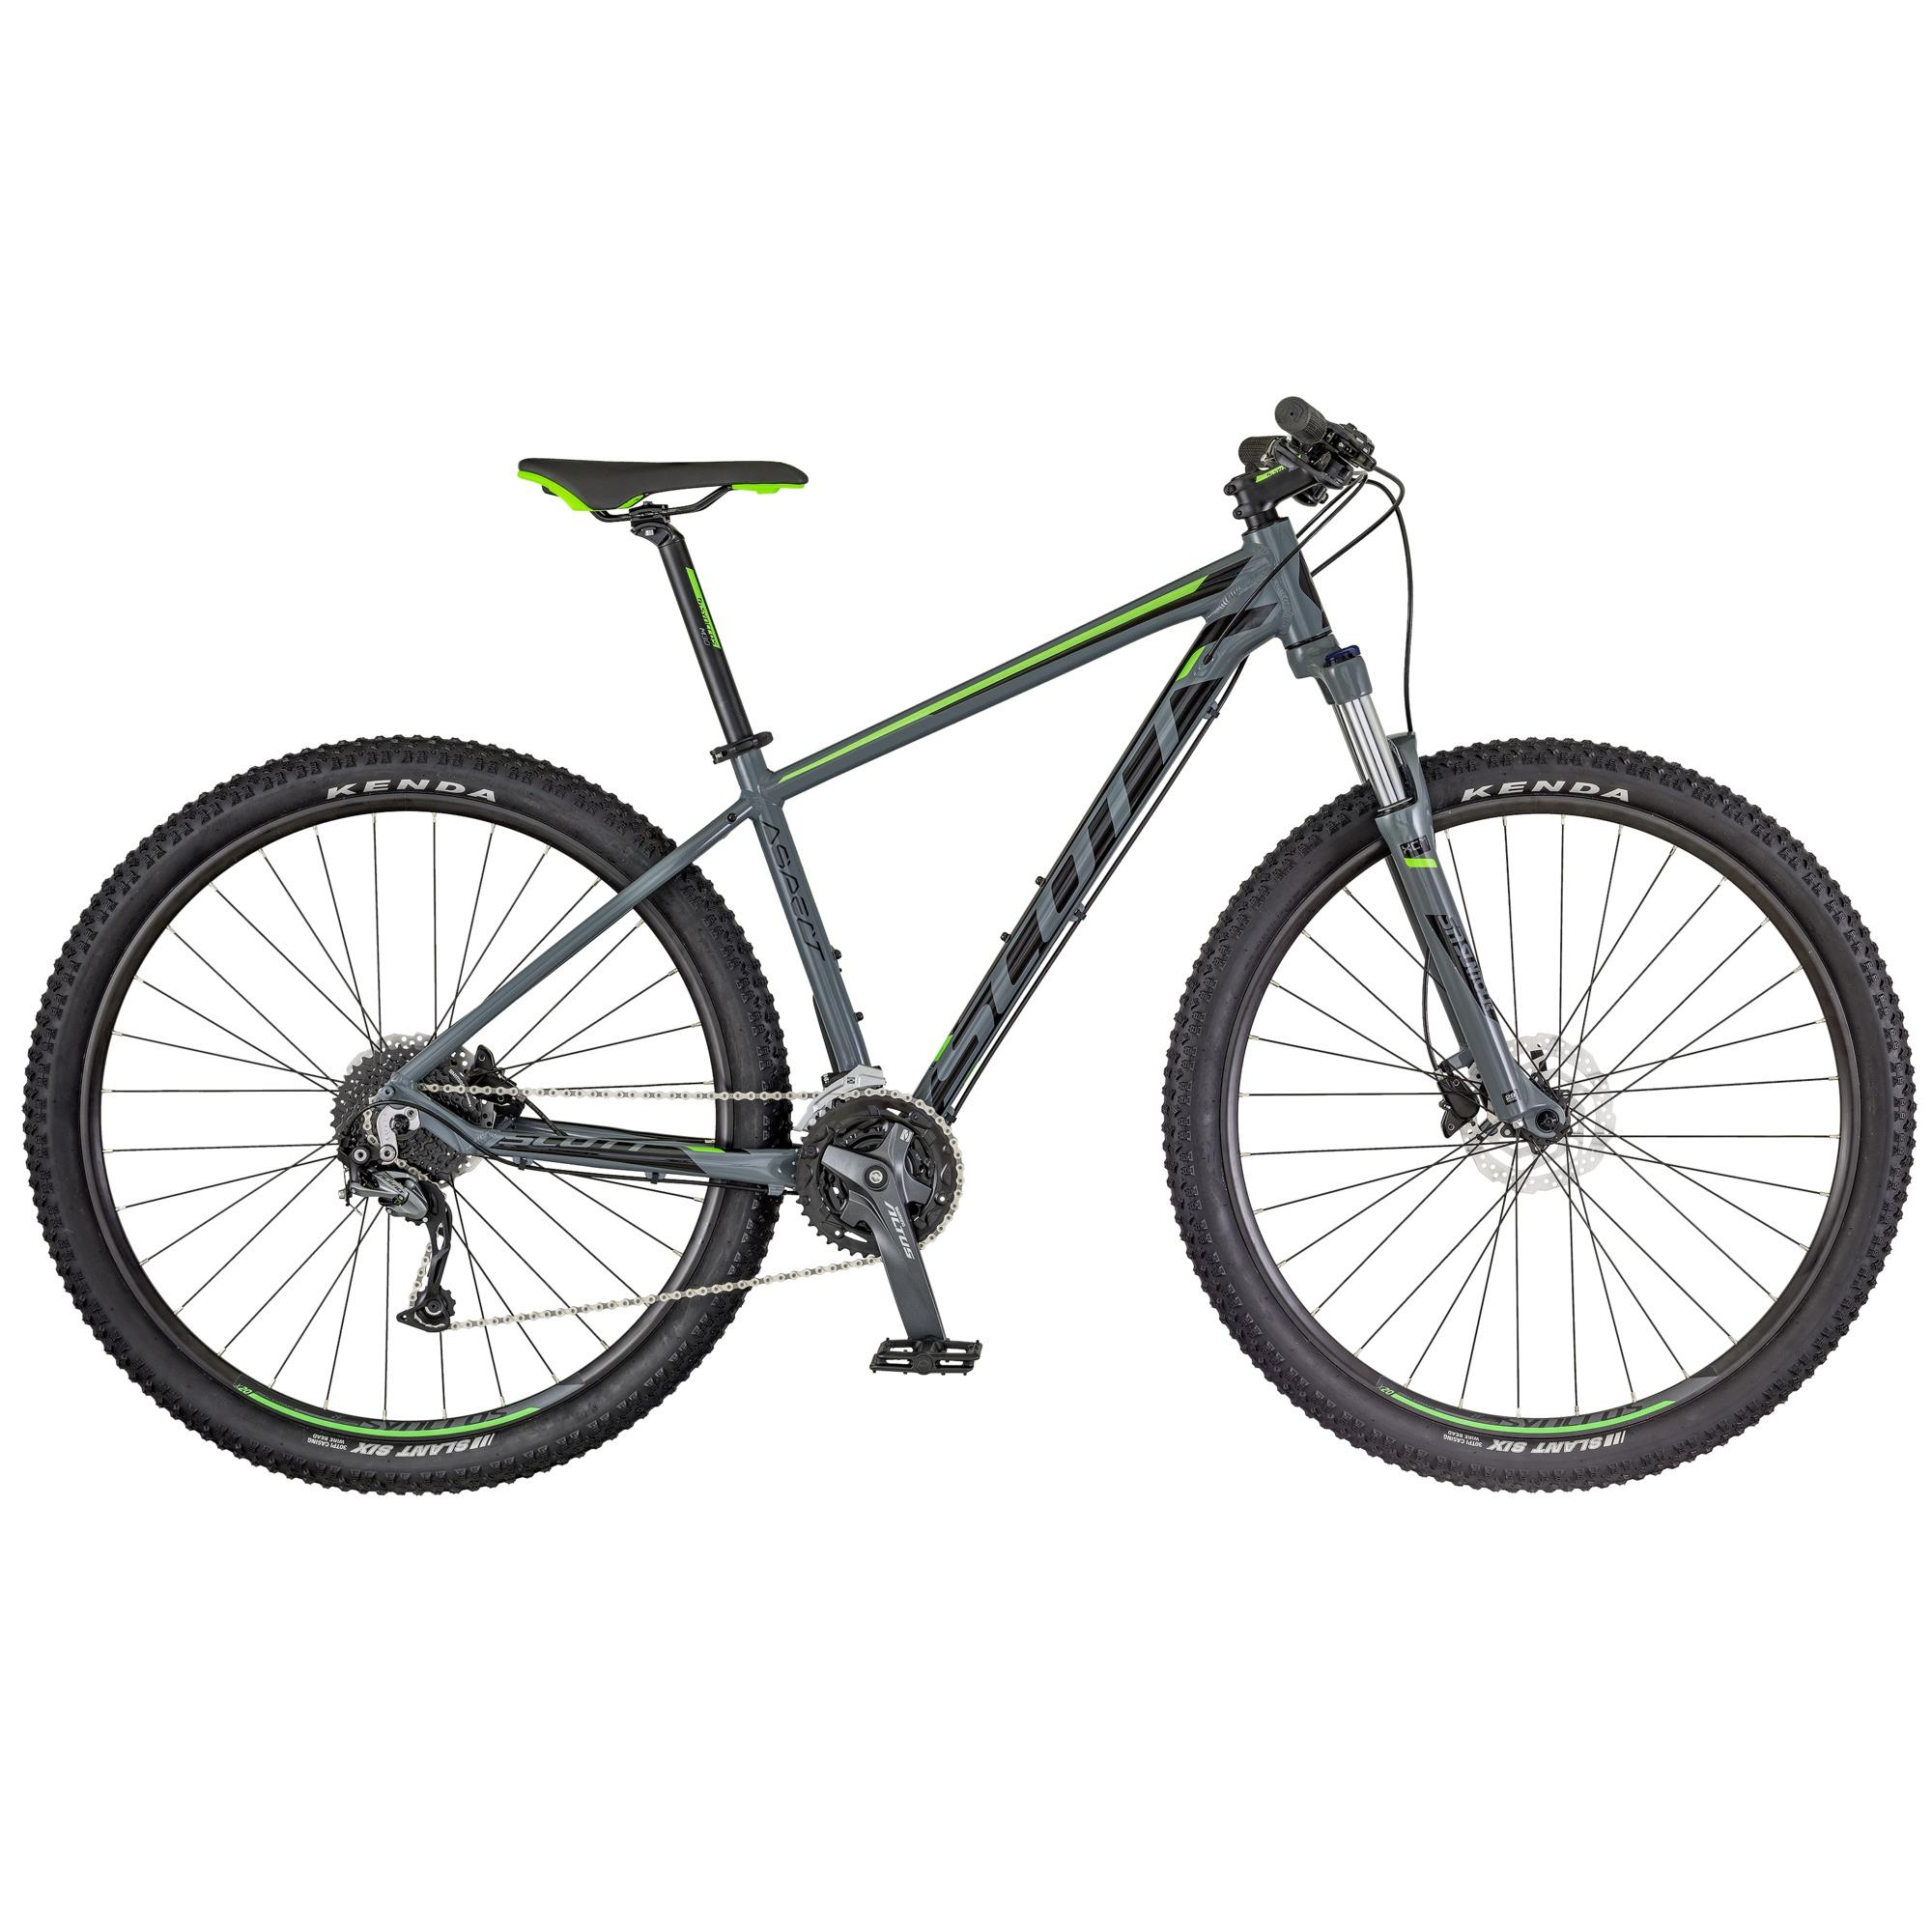 SCOTT Aspect 940 Bike grau/grün L - Zweirad Homann